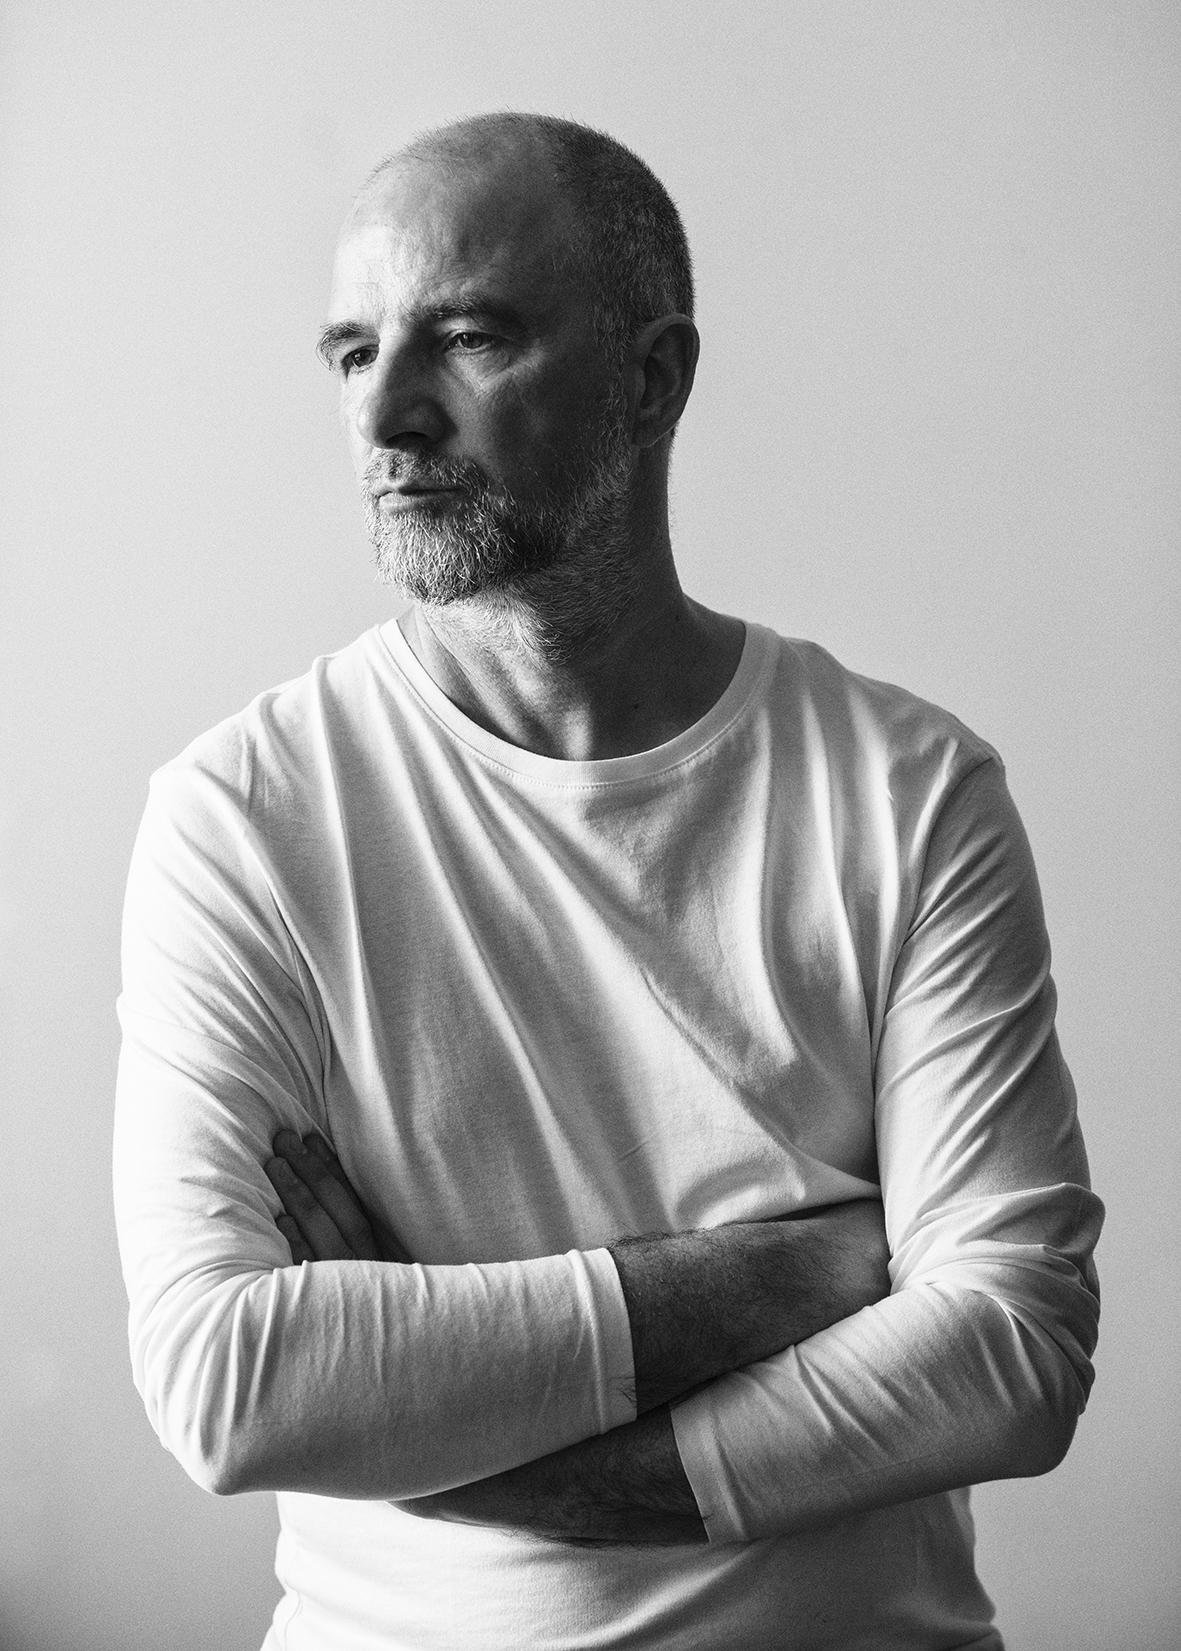 Jacek Poremba, fot. Magda Hueckel (źródło: materiały prasowe organizatora)